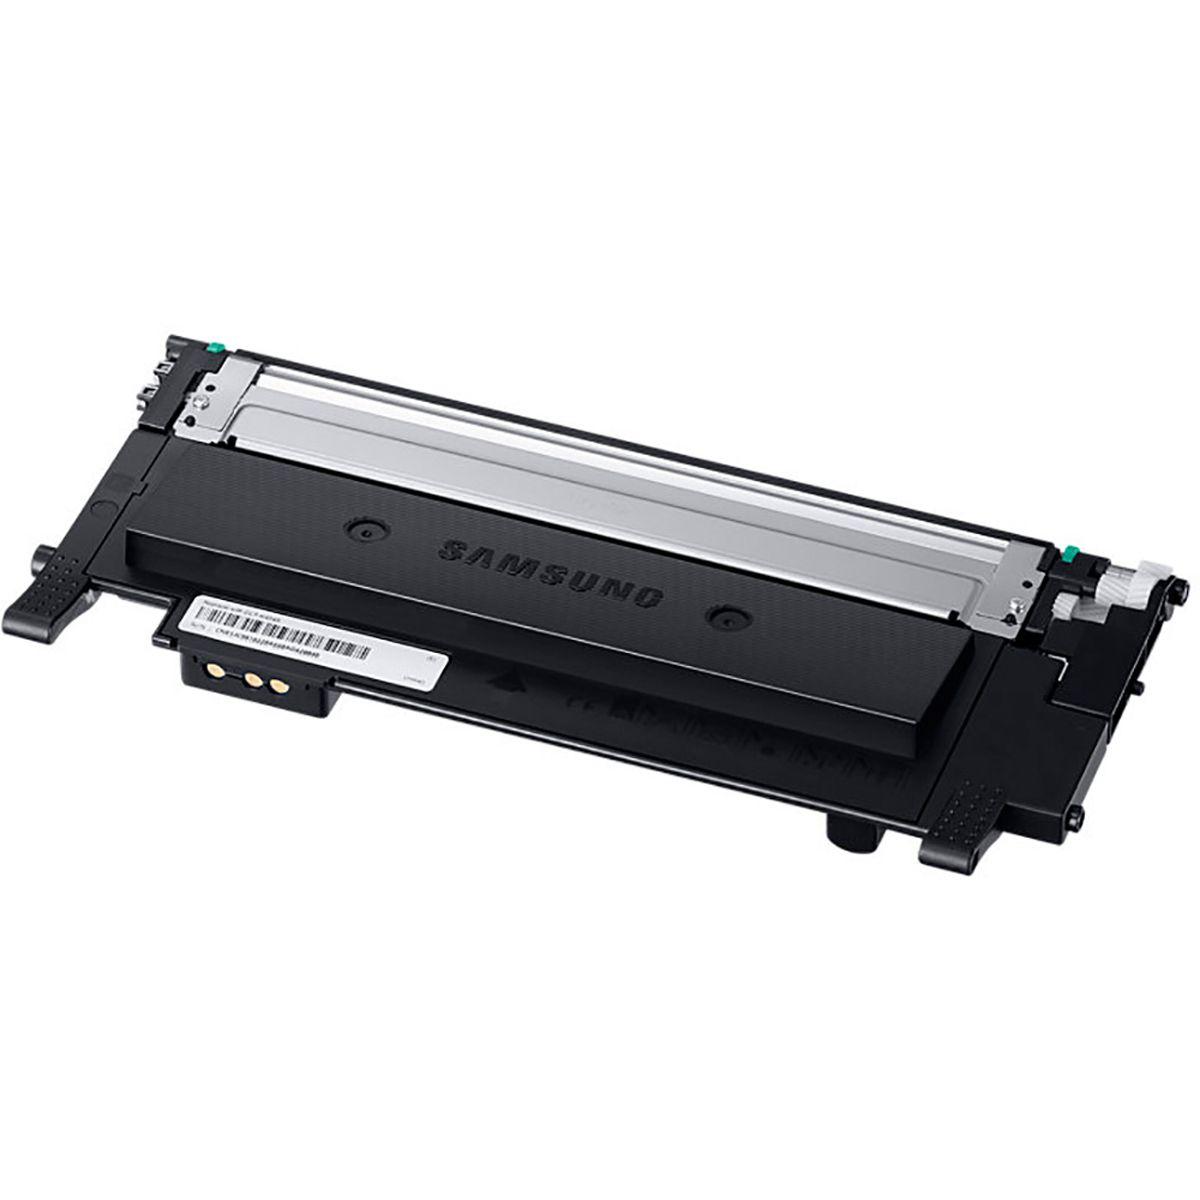 Toner Samsung CLT-K404S Preto - C430 C480 C430W C480W C480FW